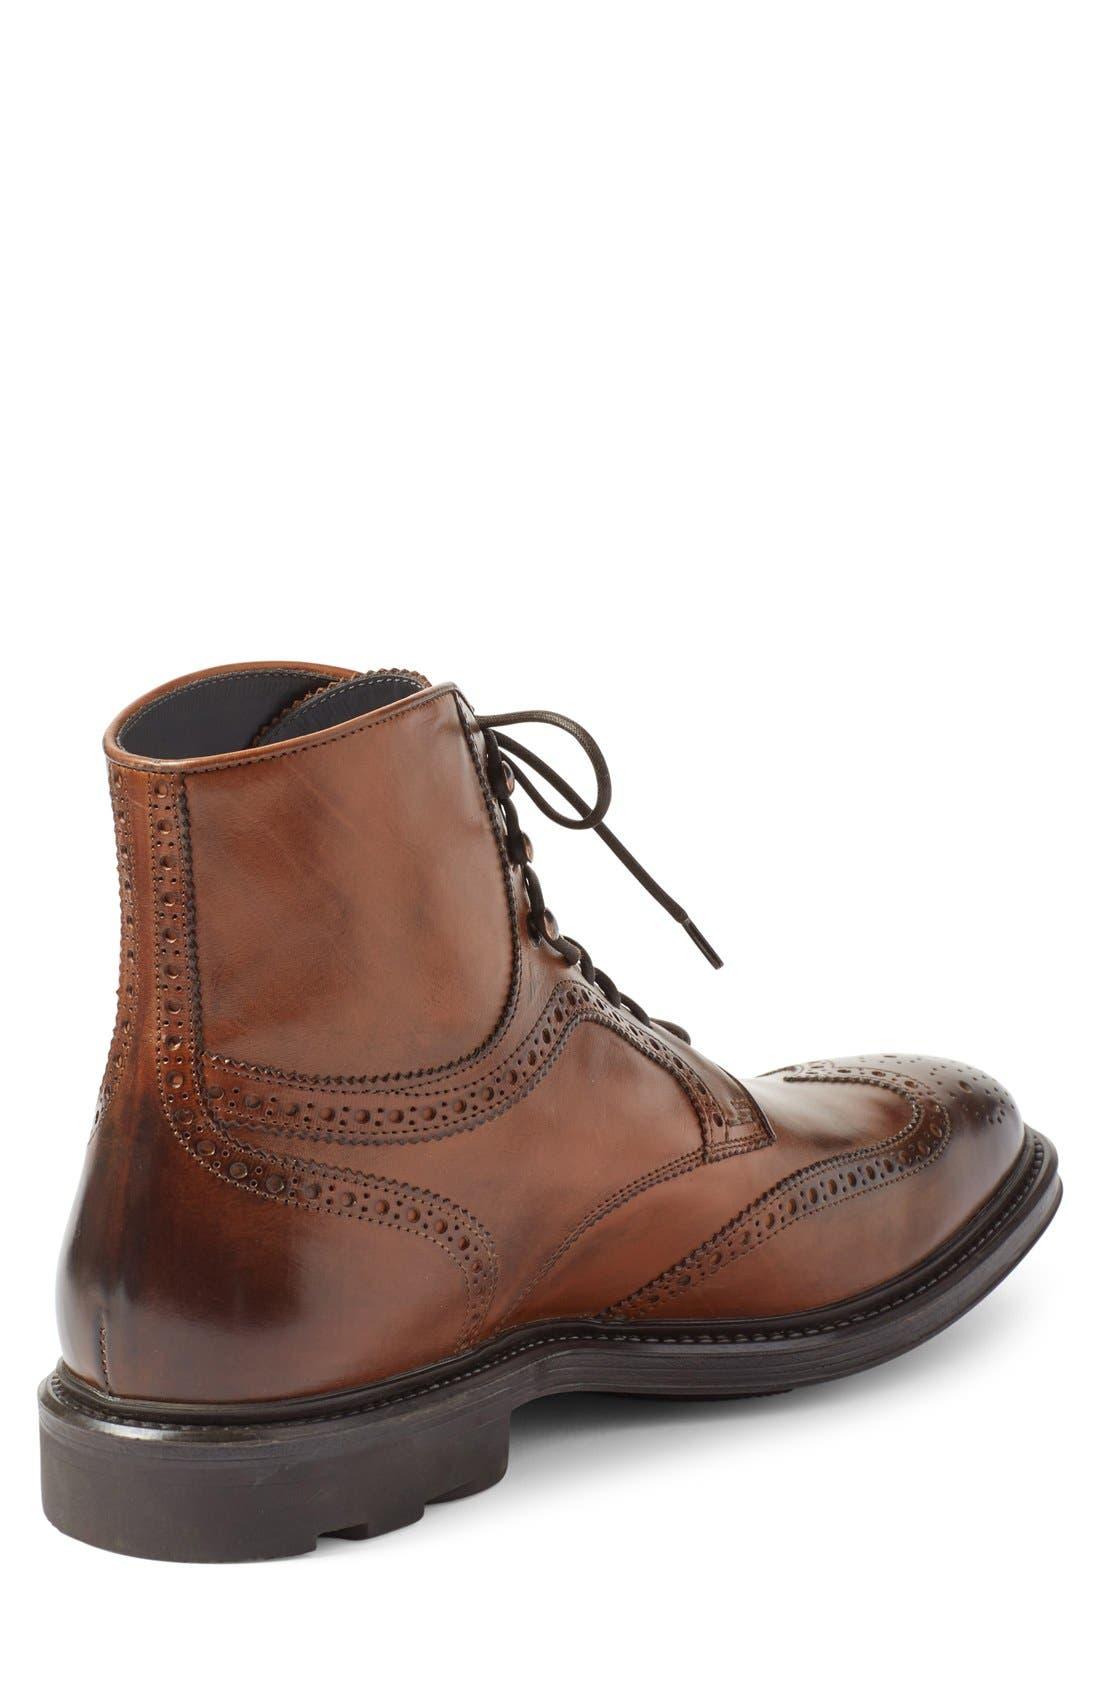 Alternate Image 2  - To Boot New York 'Hobson' Wingtip Boot (Men)